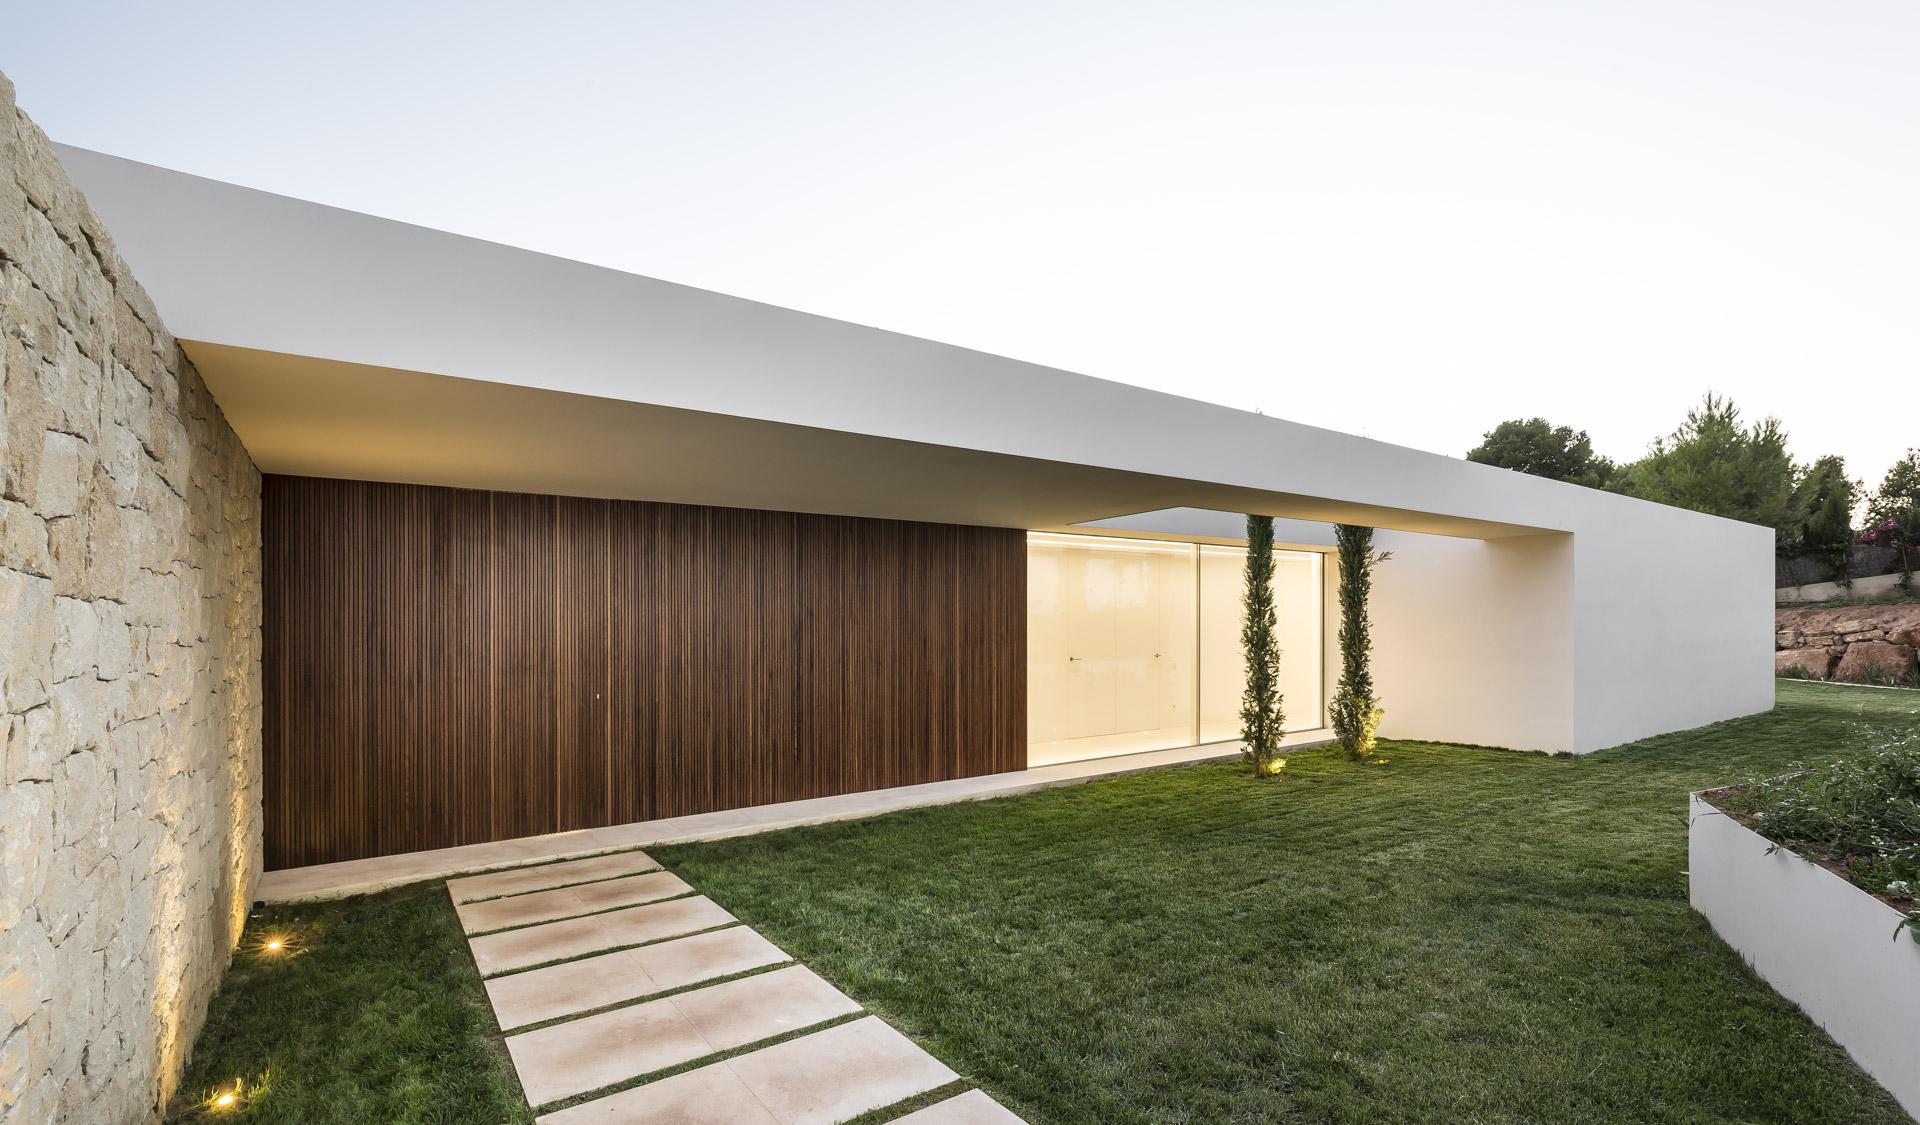 fotografia-arquitectura-valencia-german-cabo-gallardo-llopis-villamarchante-vivienda-55